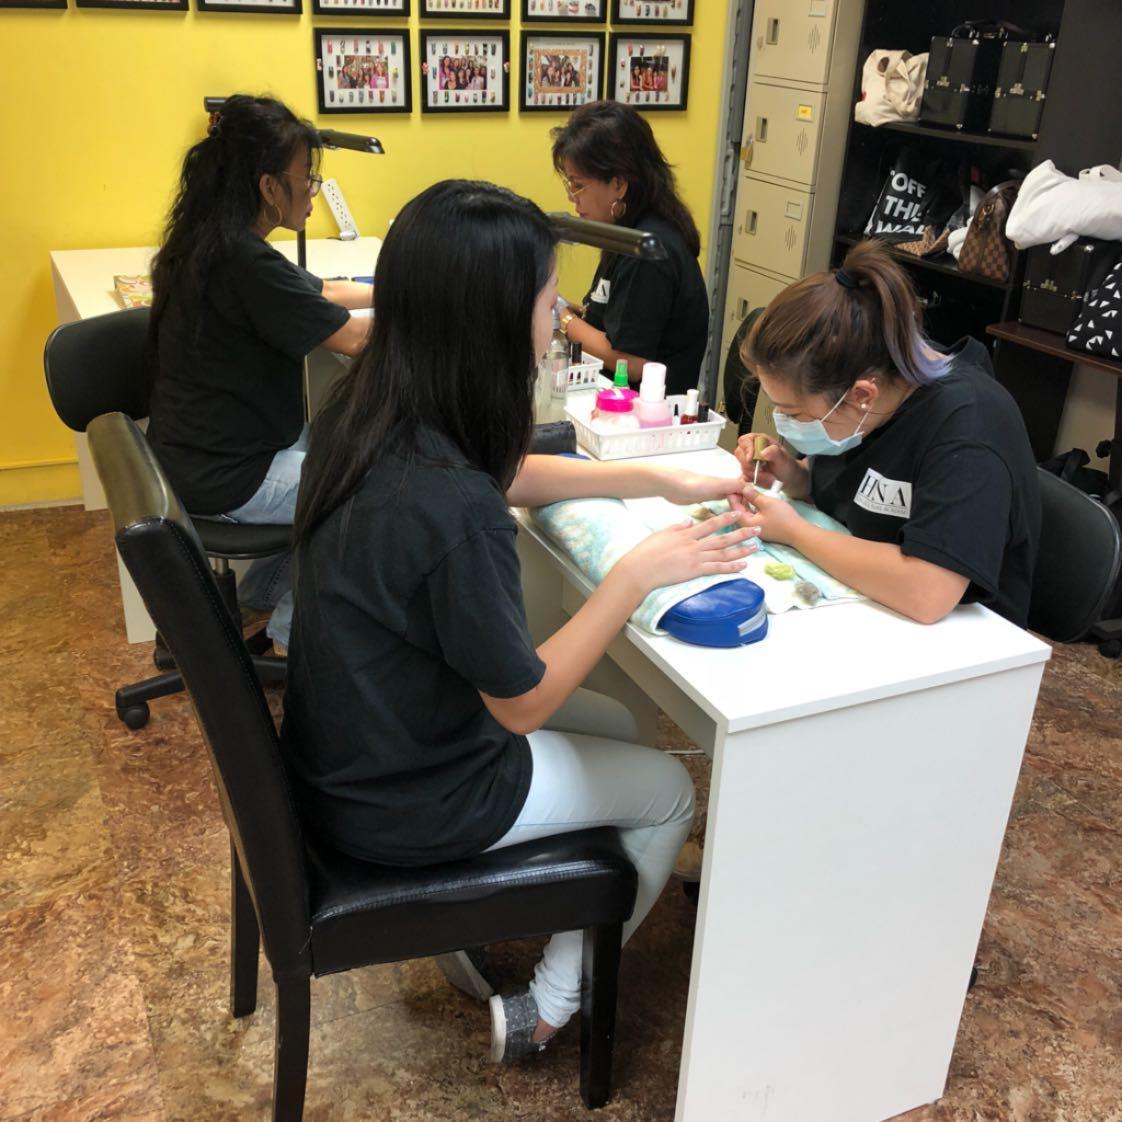 Honolulu Nails & Esthetics Academy (ネイル&エステ) image 2